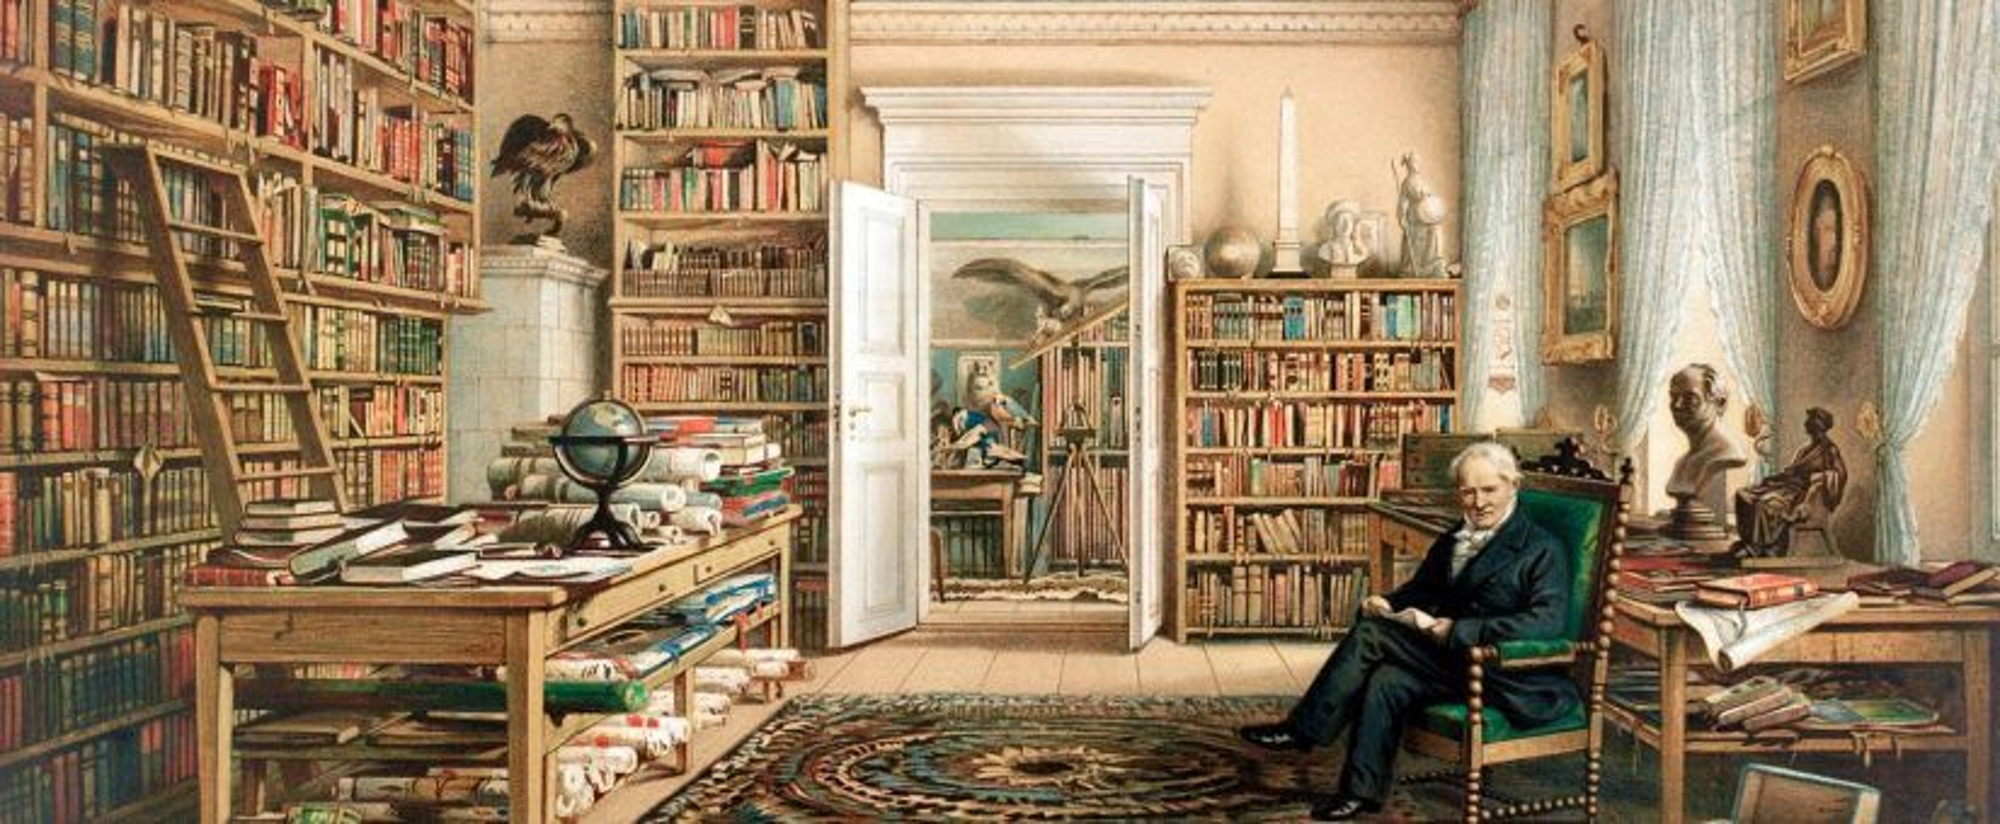 humboldt-library-berlin-1856recorte-825x340.jpg